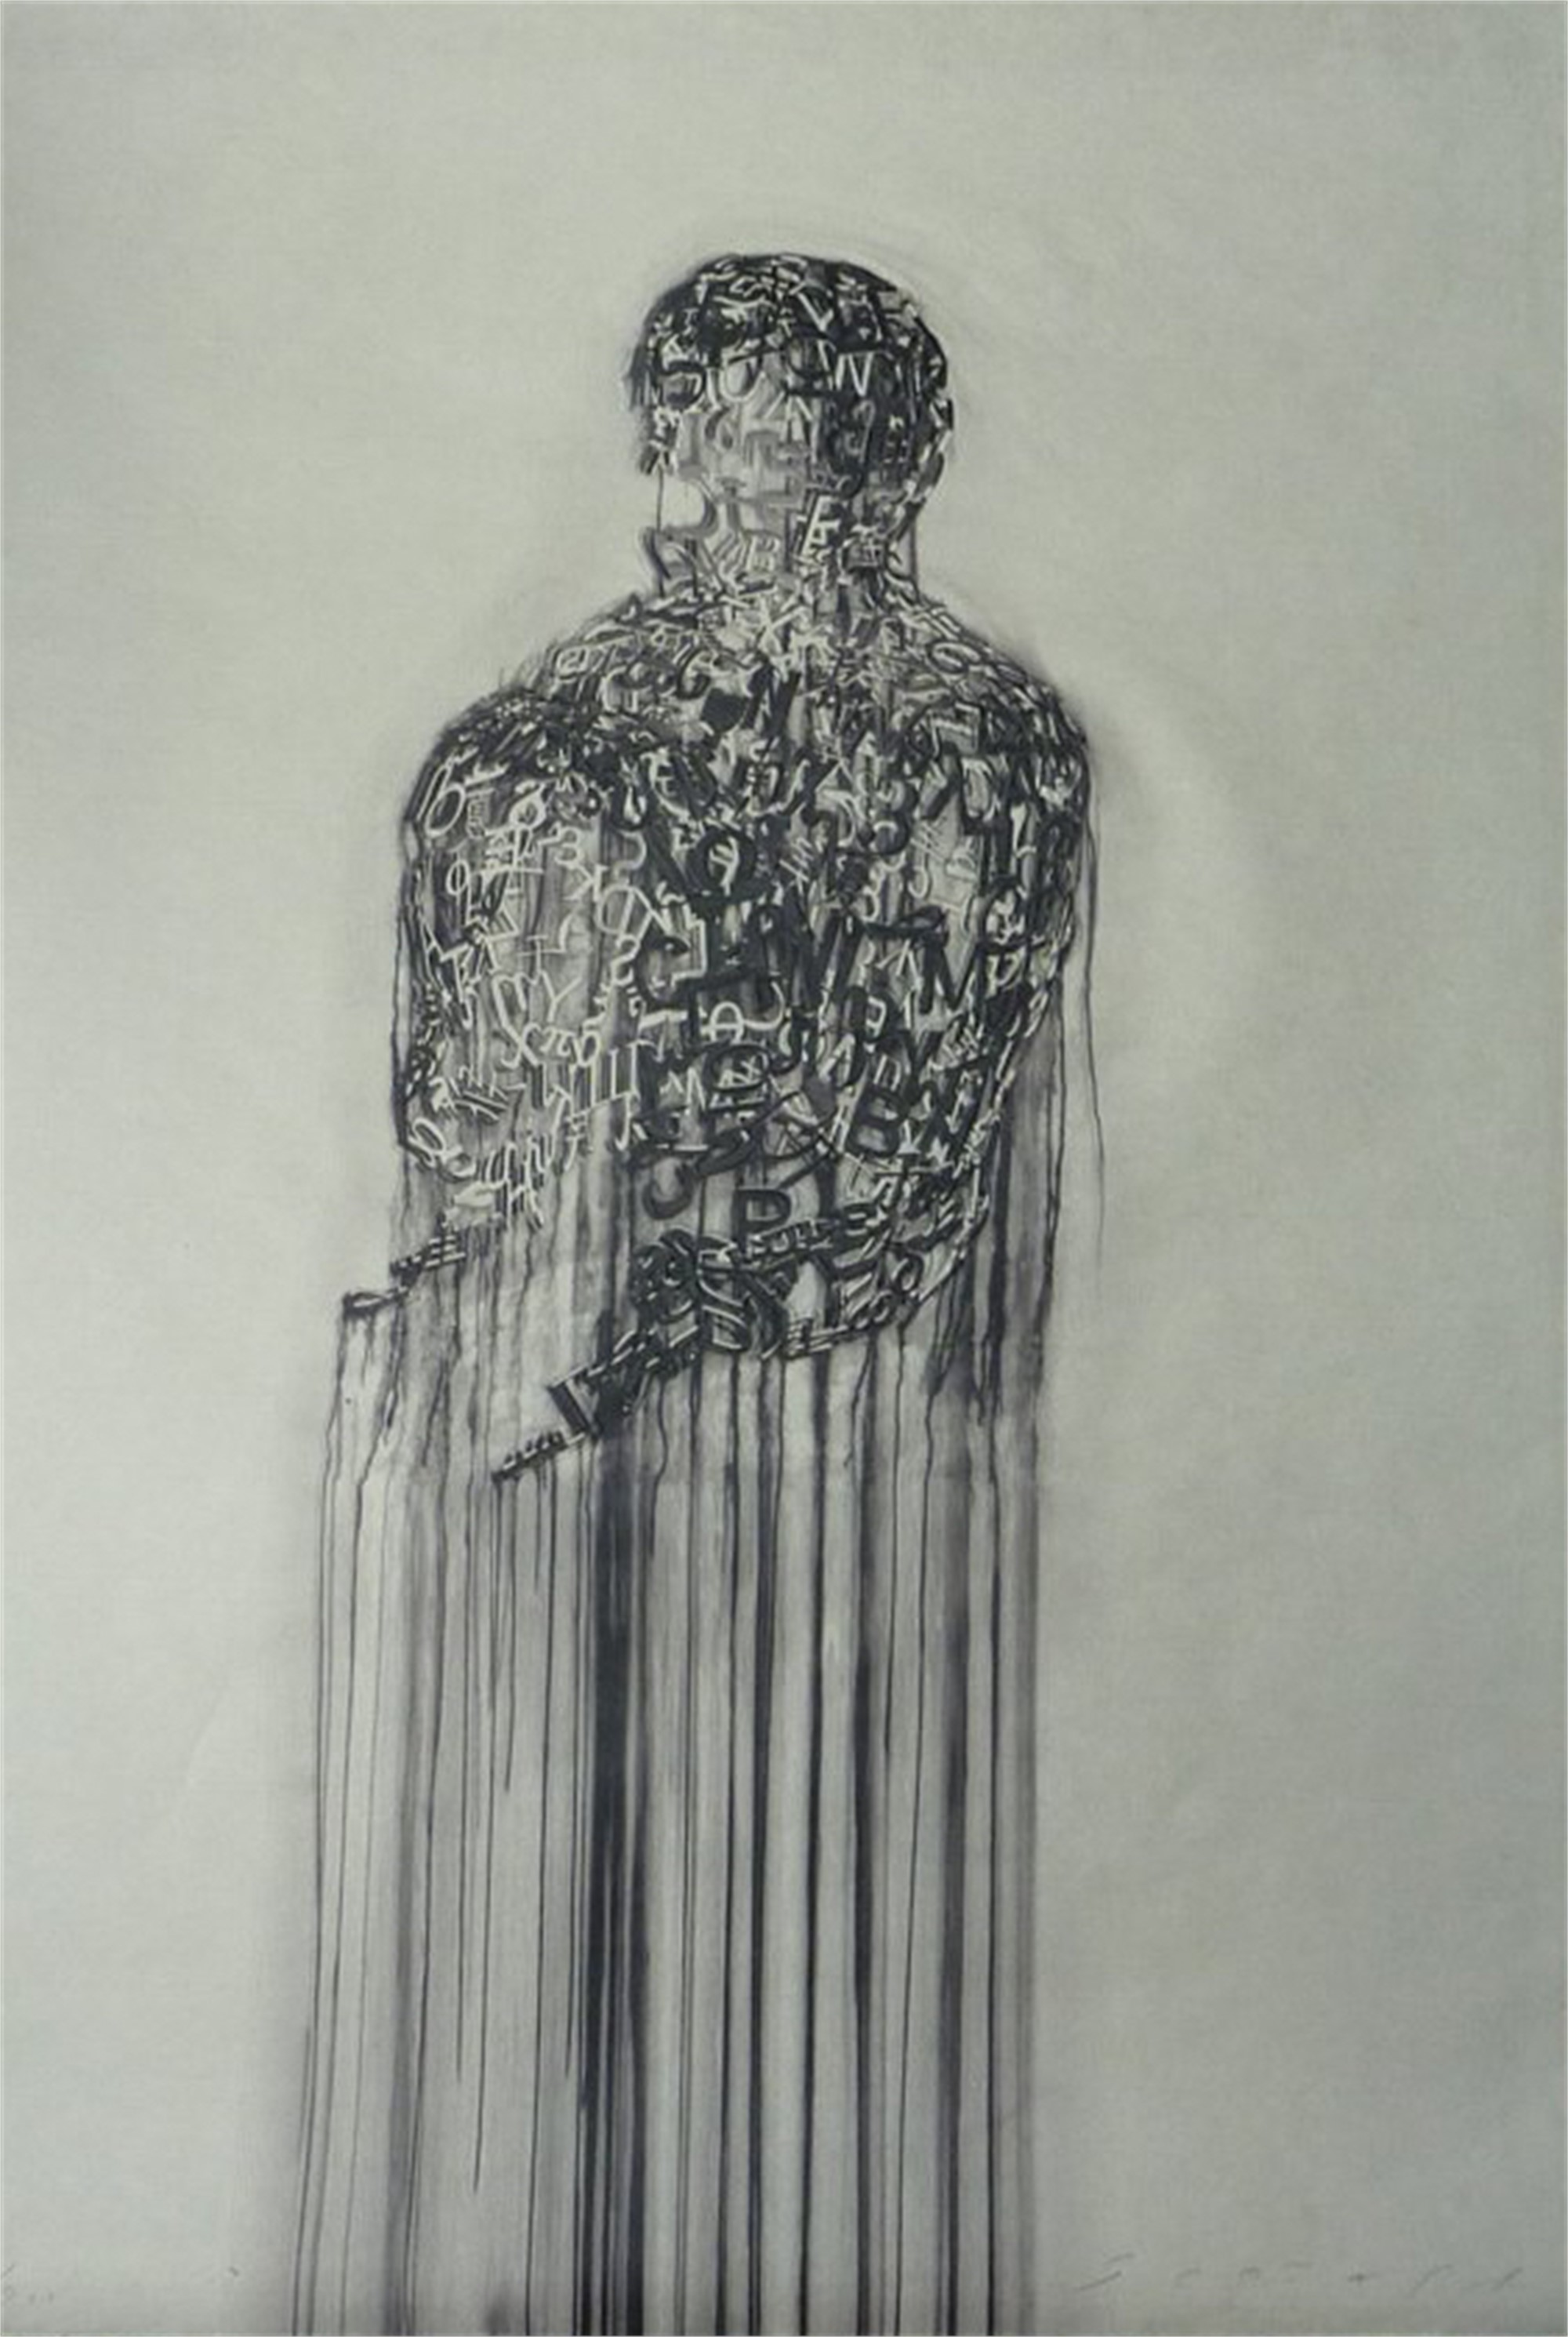 Untitled (Nomad) by Jaume Plensa